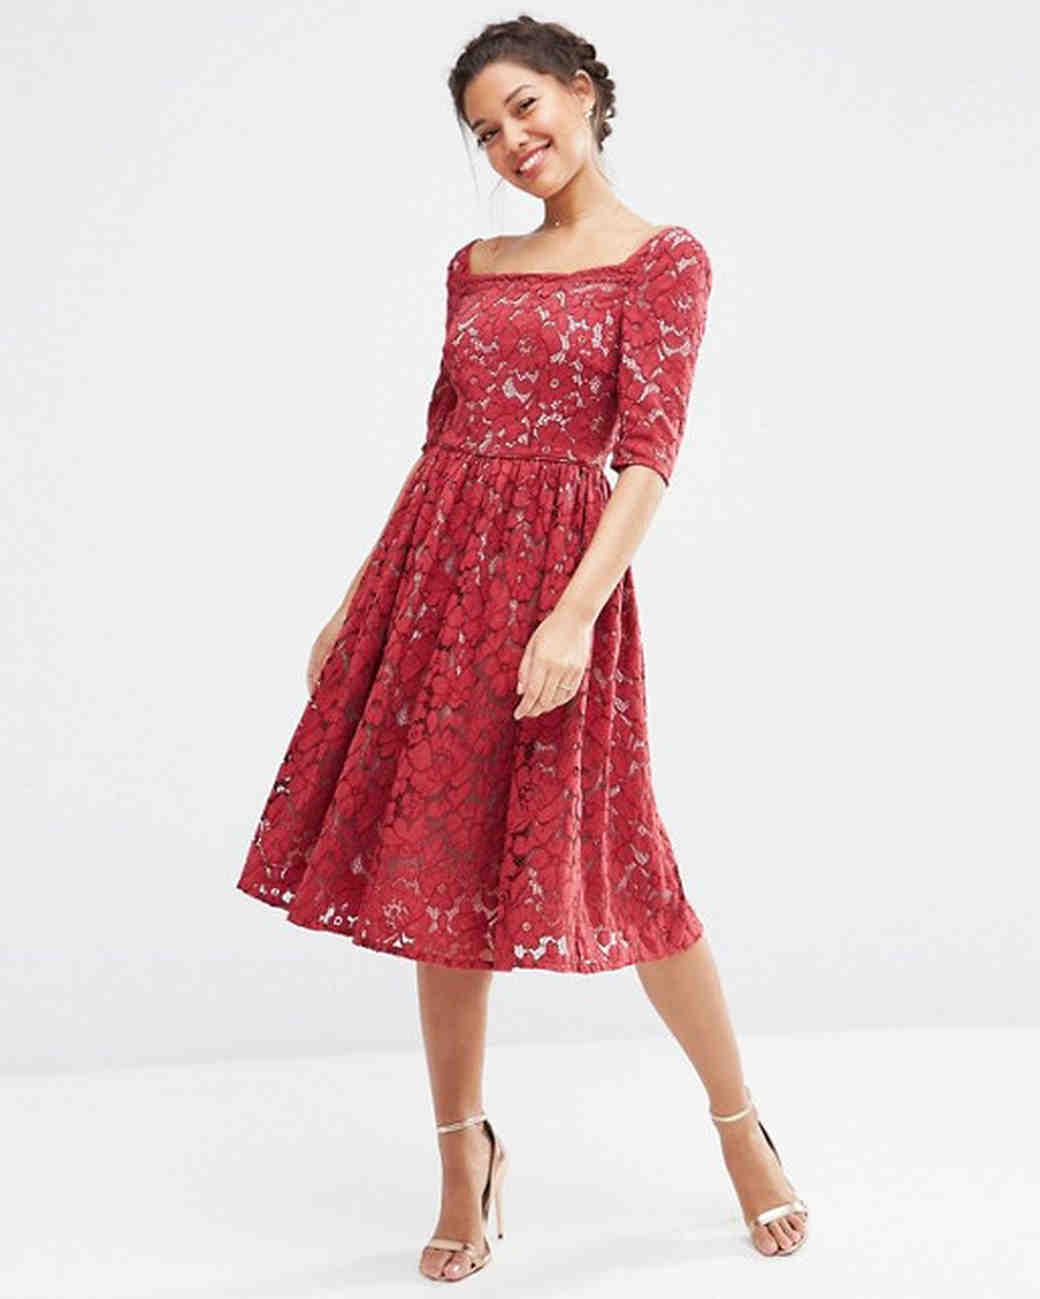 Red bridesmaid dresses martha stewart weddings ombrellifo Gallery